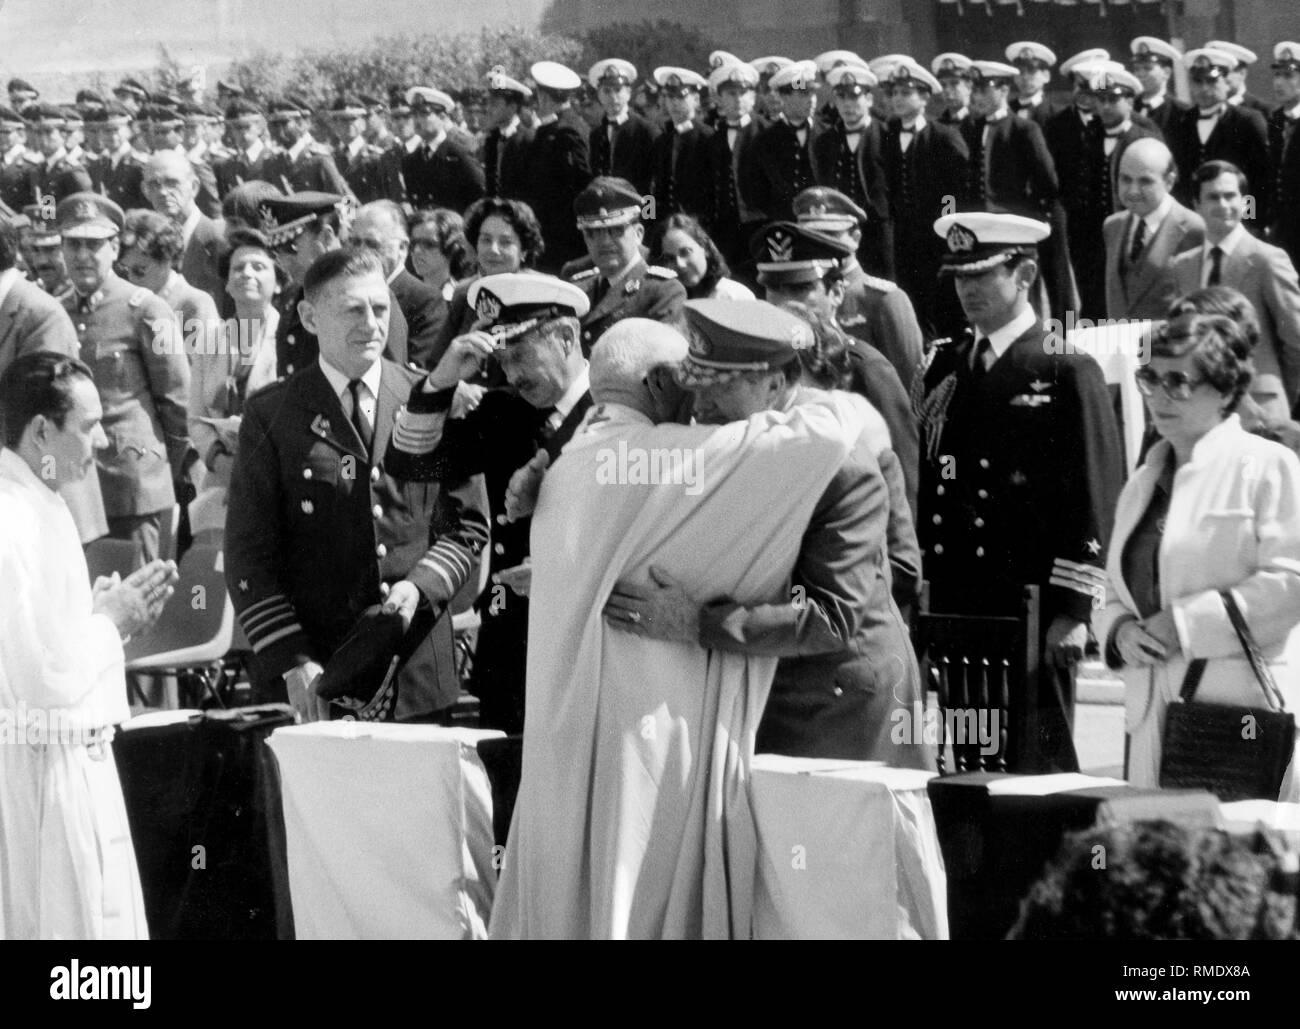 Augusto Pinochet Military Fotos E Imagenes De Stock Alamy